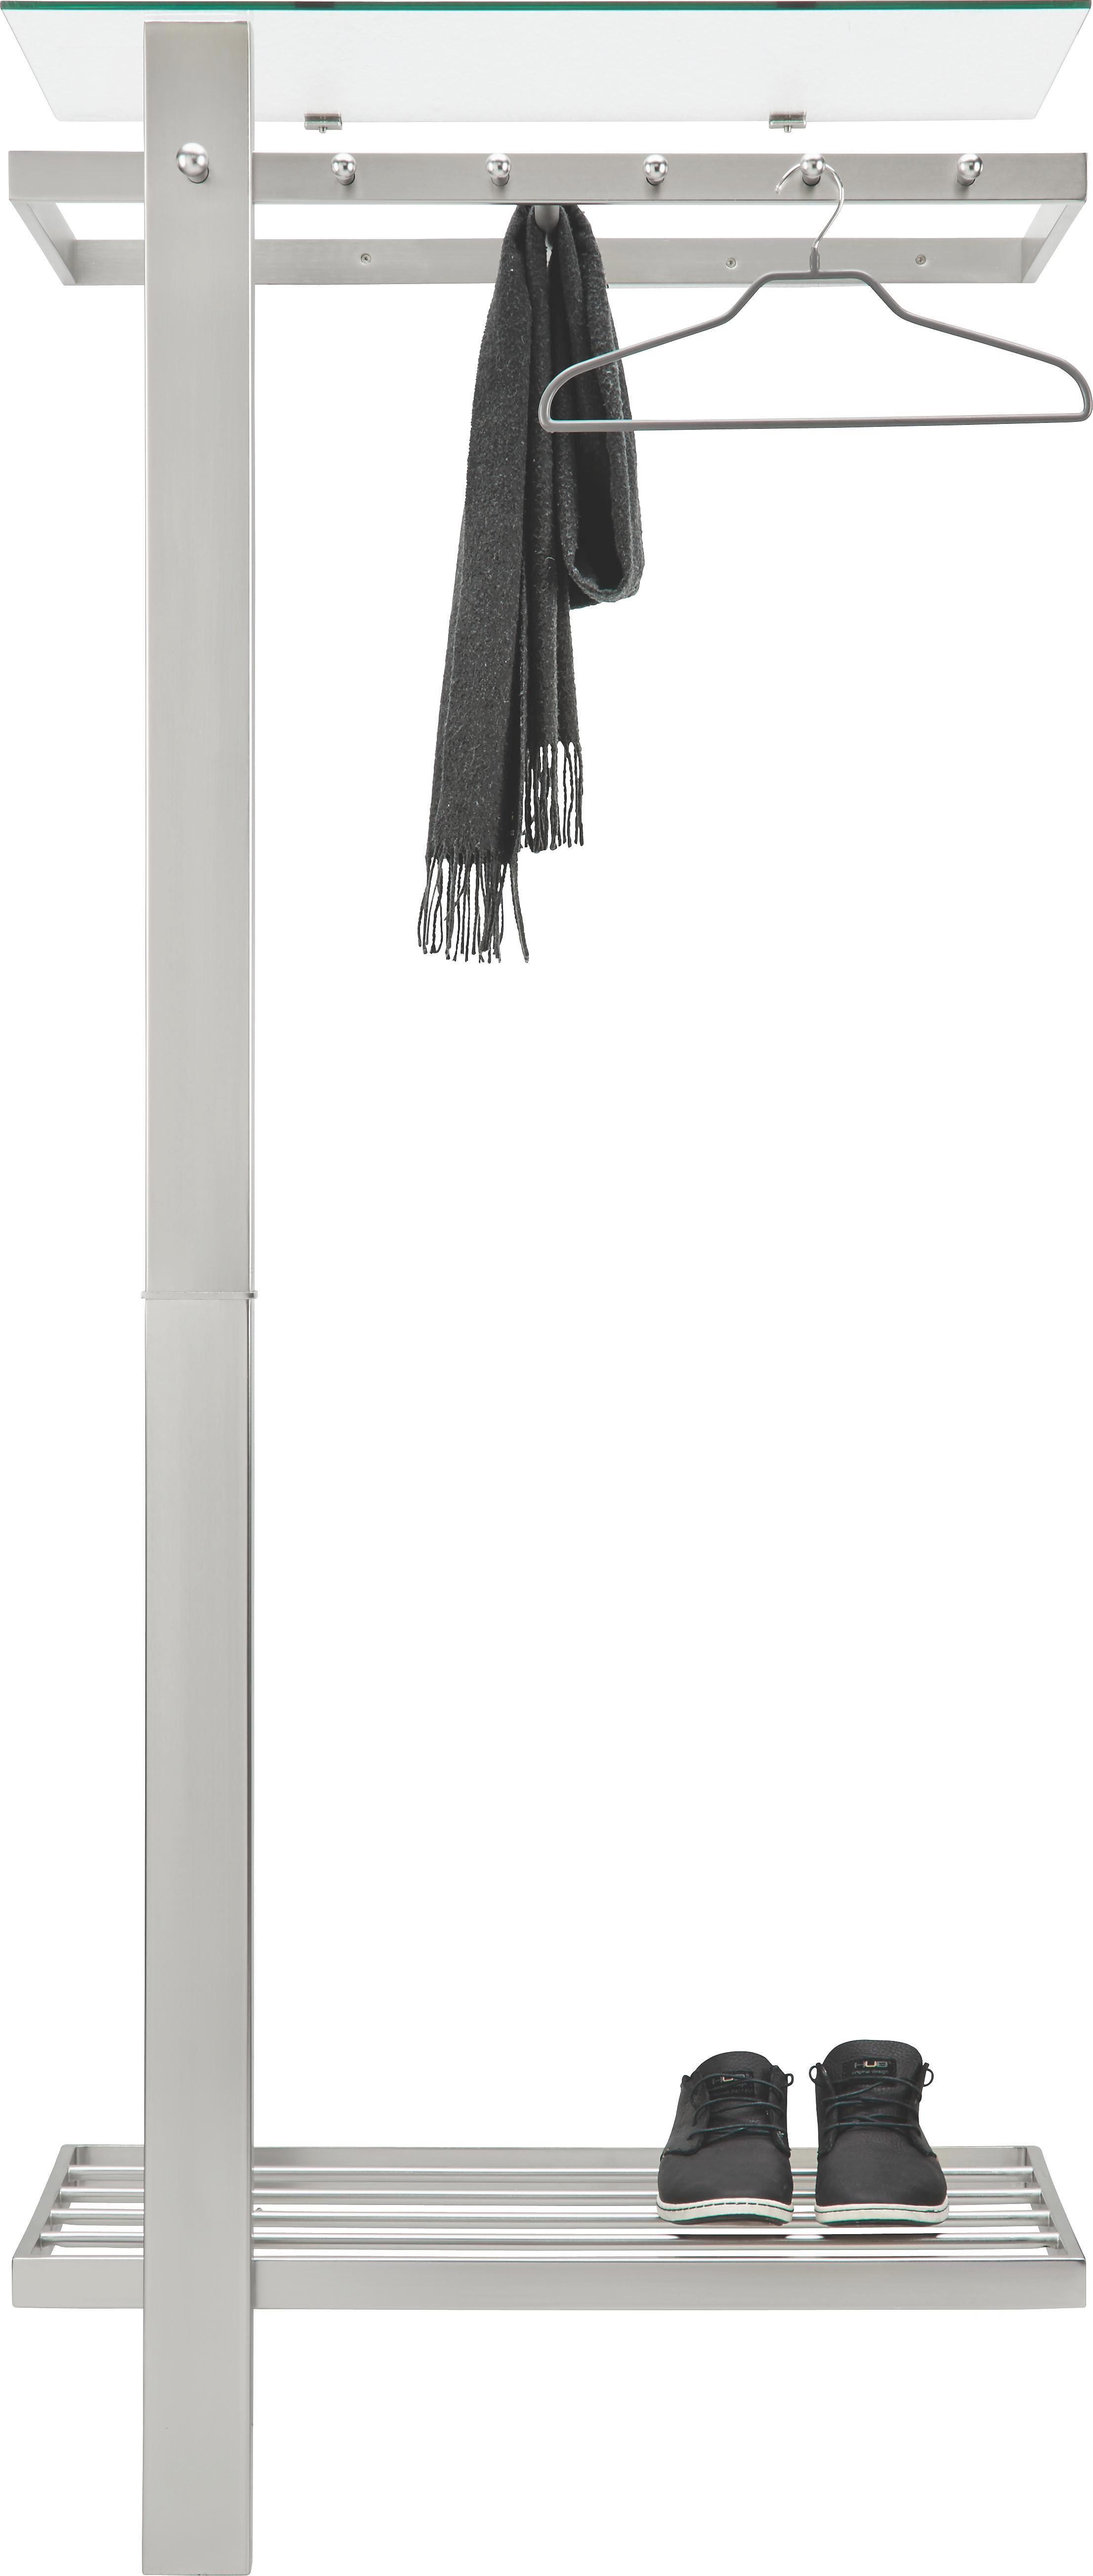 Garderobe in Edelstahloptik - Edelstahlfarben, MODERN, Glas/Metall (80/190/43cm) - MÖMAX modern living